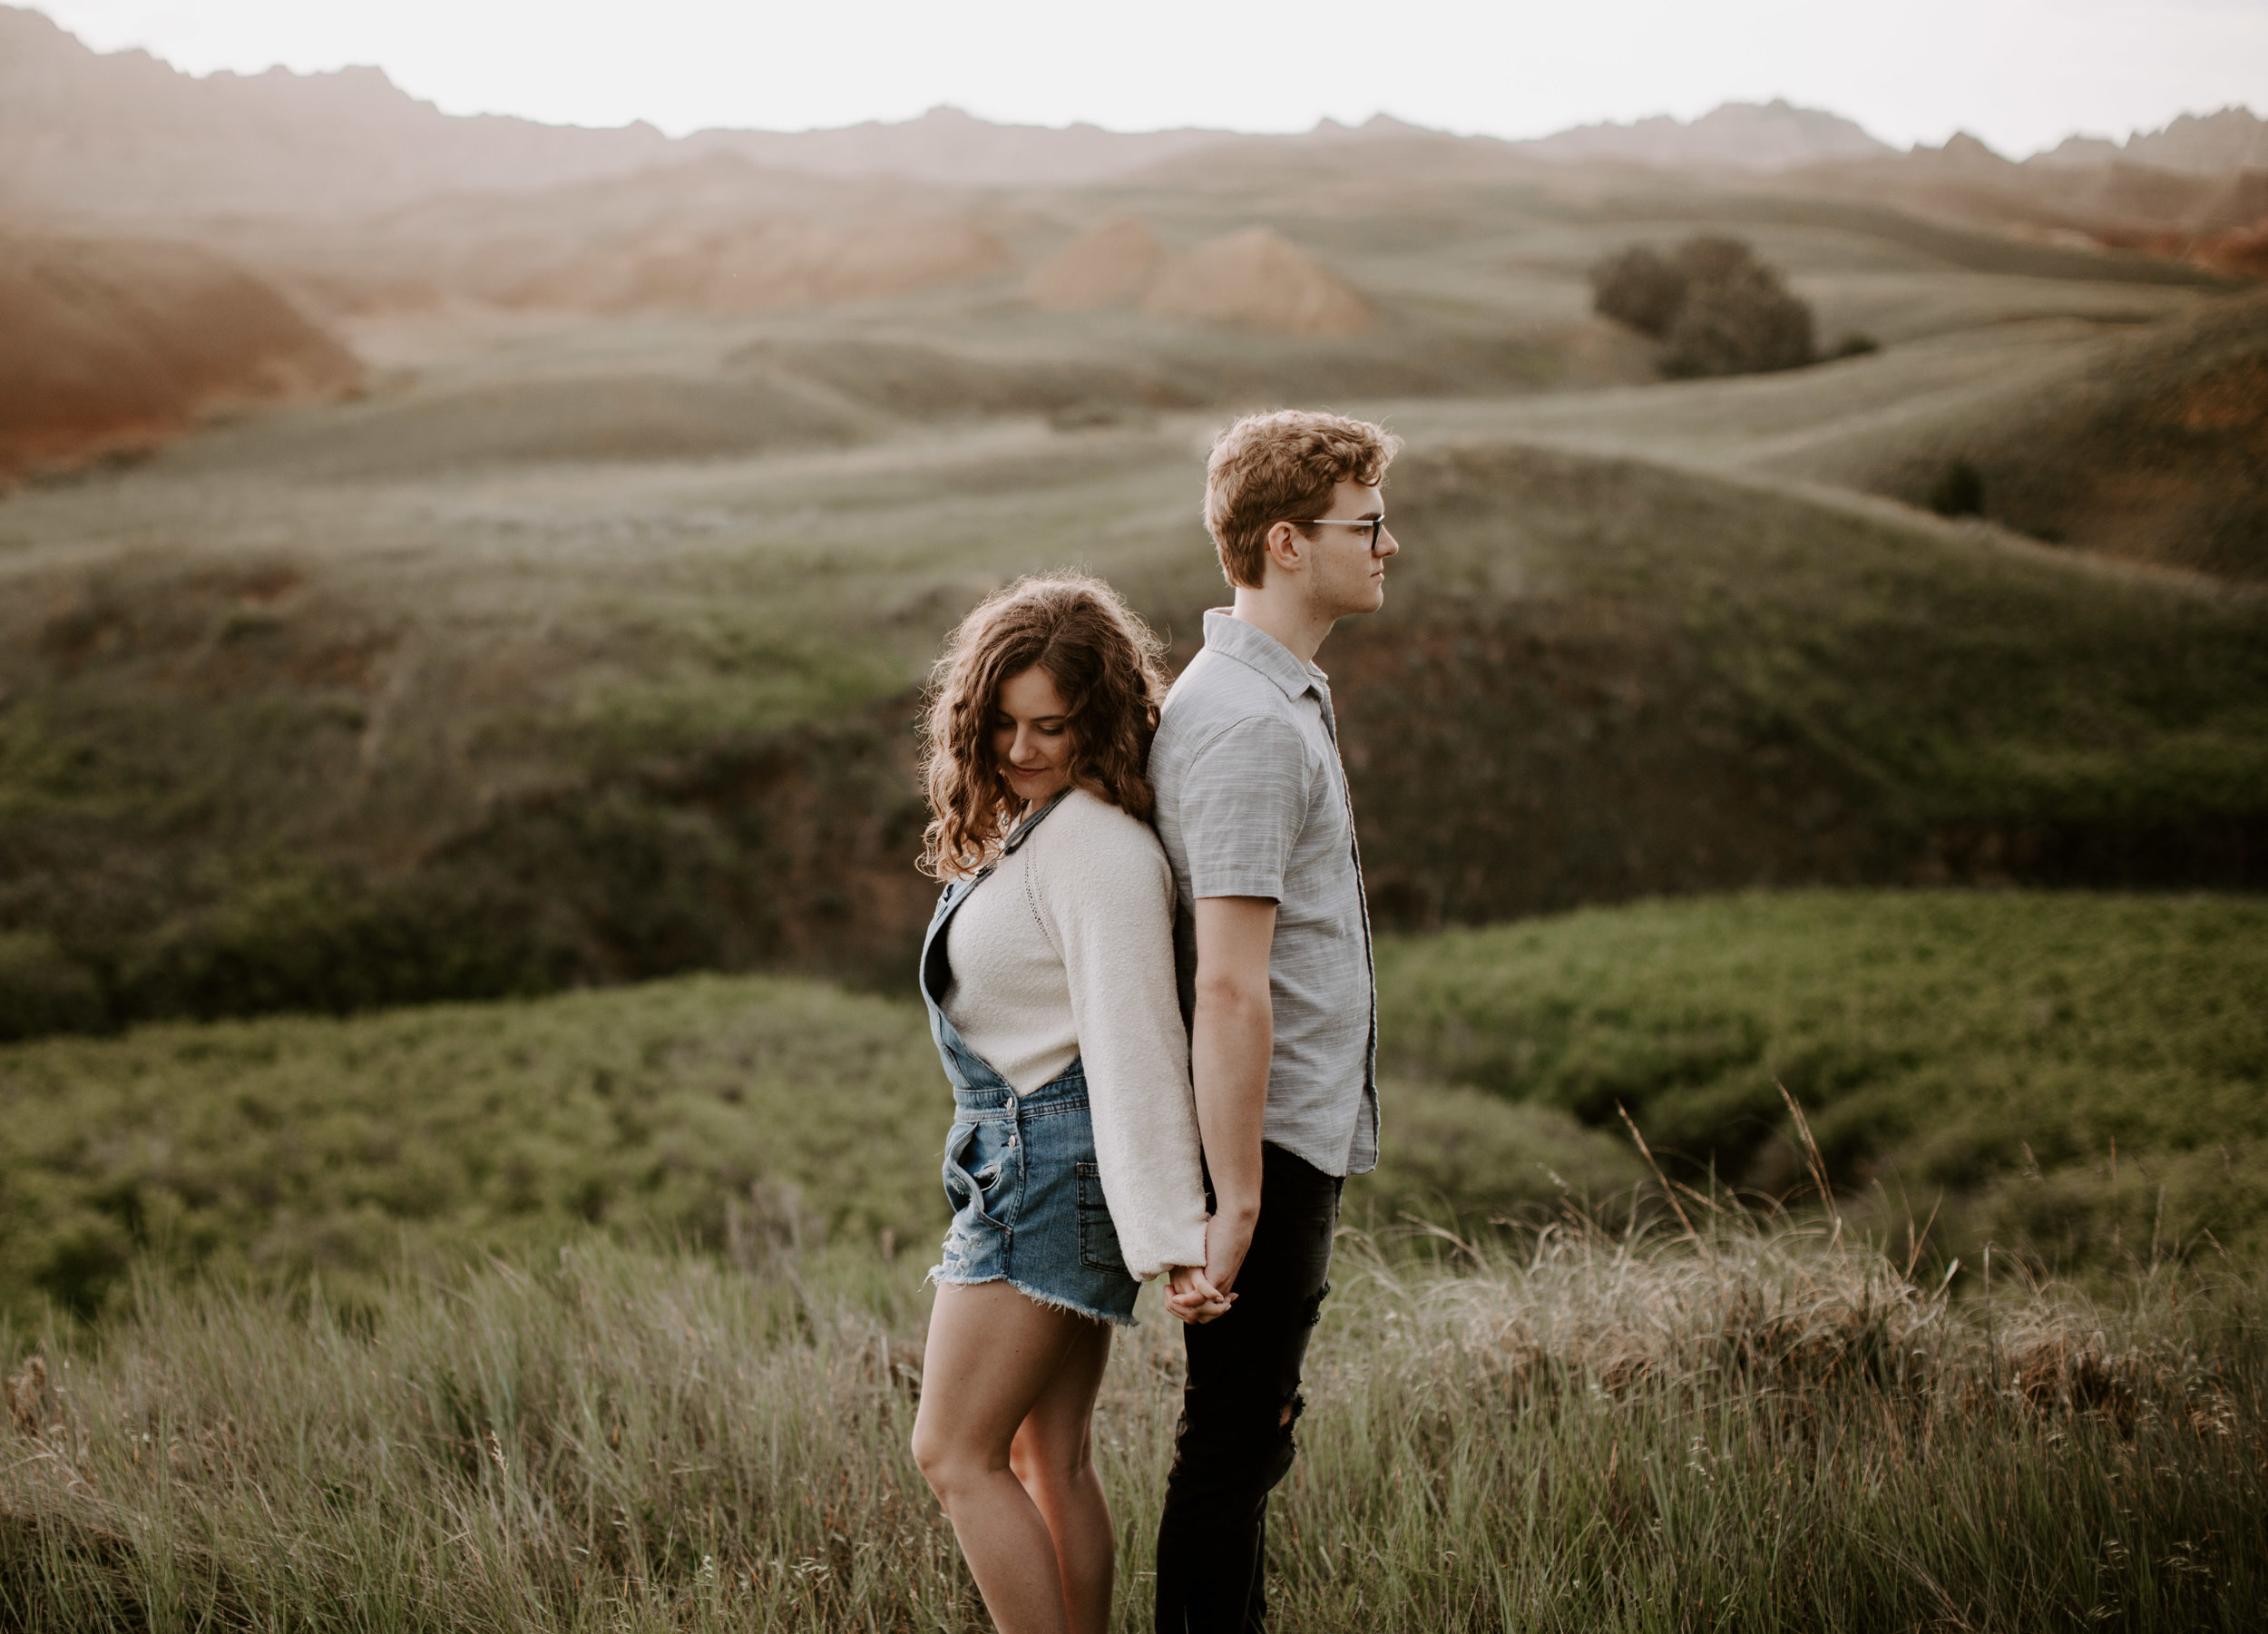 KAYLIN & MAX - Badlands lovers session